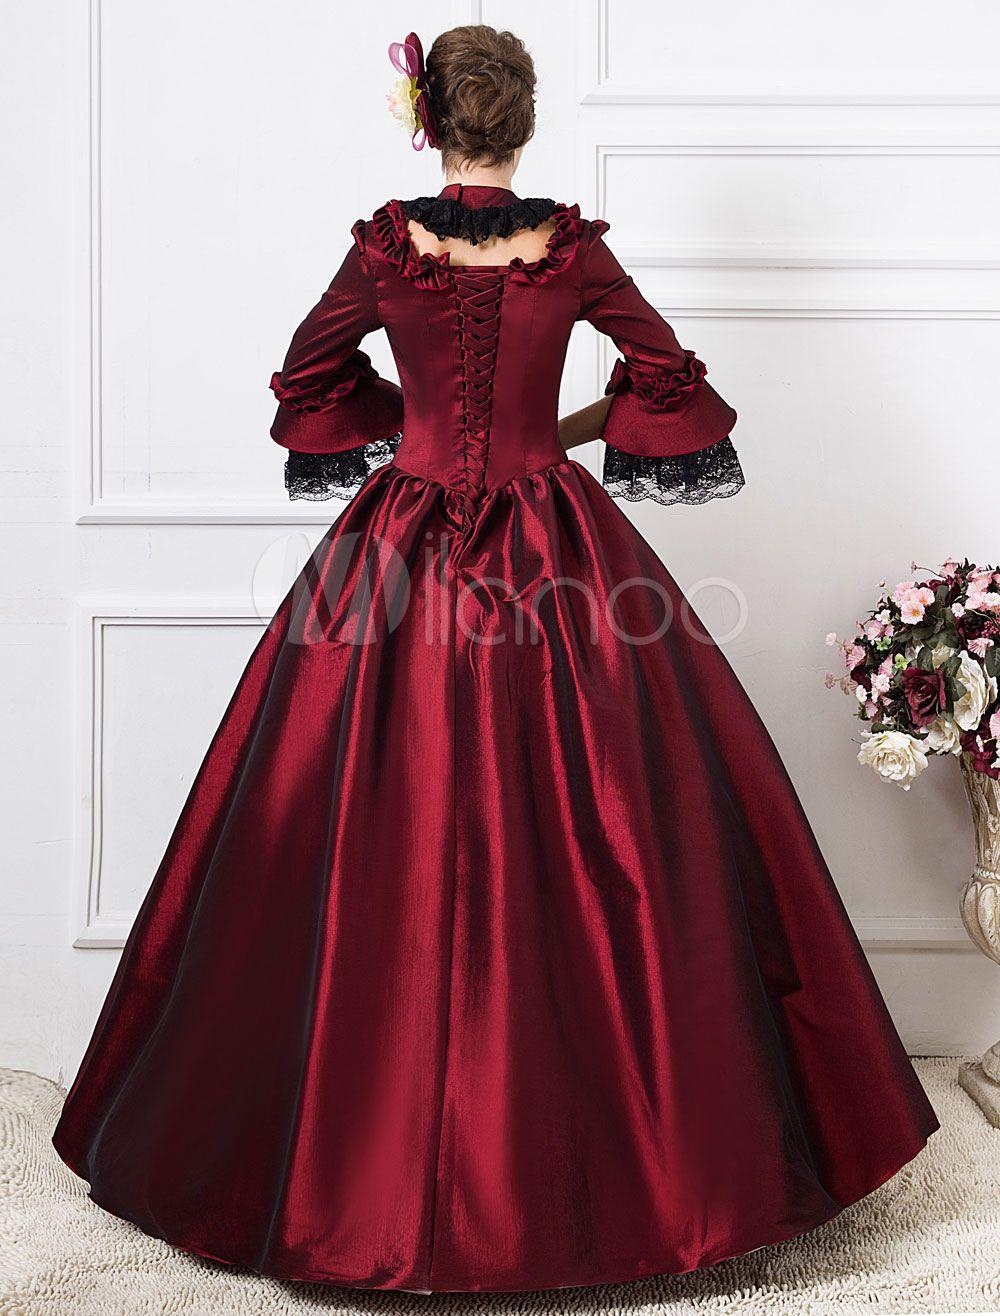 Victorian Dress Costume Women S Dark Red Victorian Era Clothing Half Sleeves Ball Gown Retro Costumes Dress Halloween Ball Gowns Victorian Dress Costume Victorian Prom Dress [ 1316 x 1000 Pixel ]